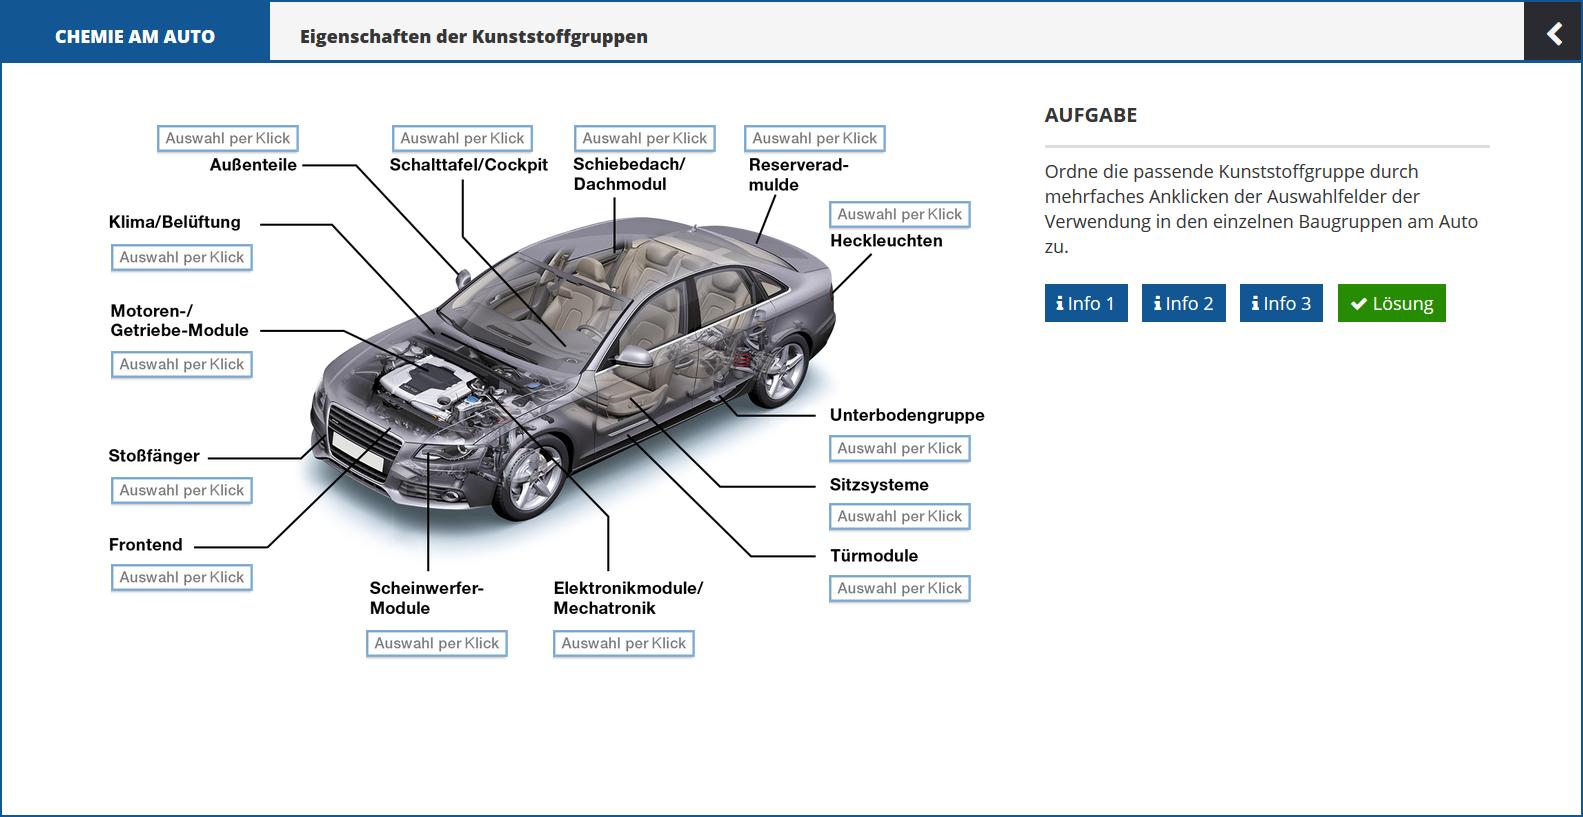 Chemie am Auto - Kunststoffe